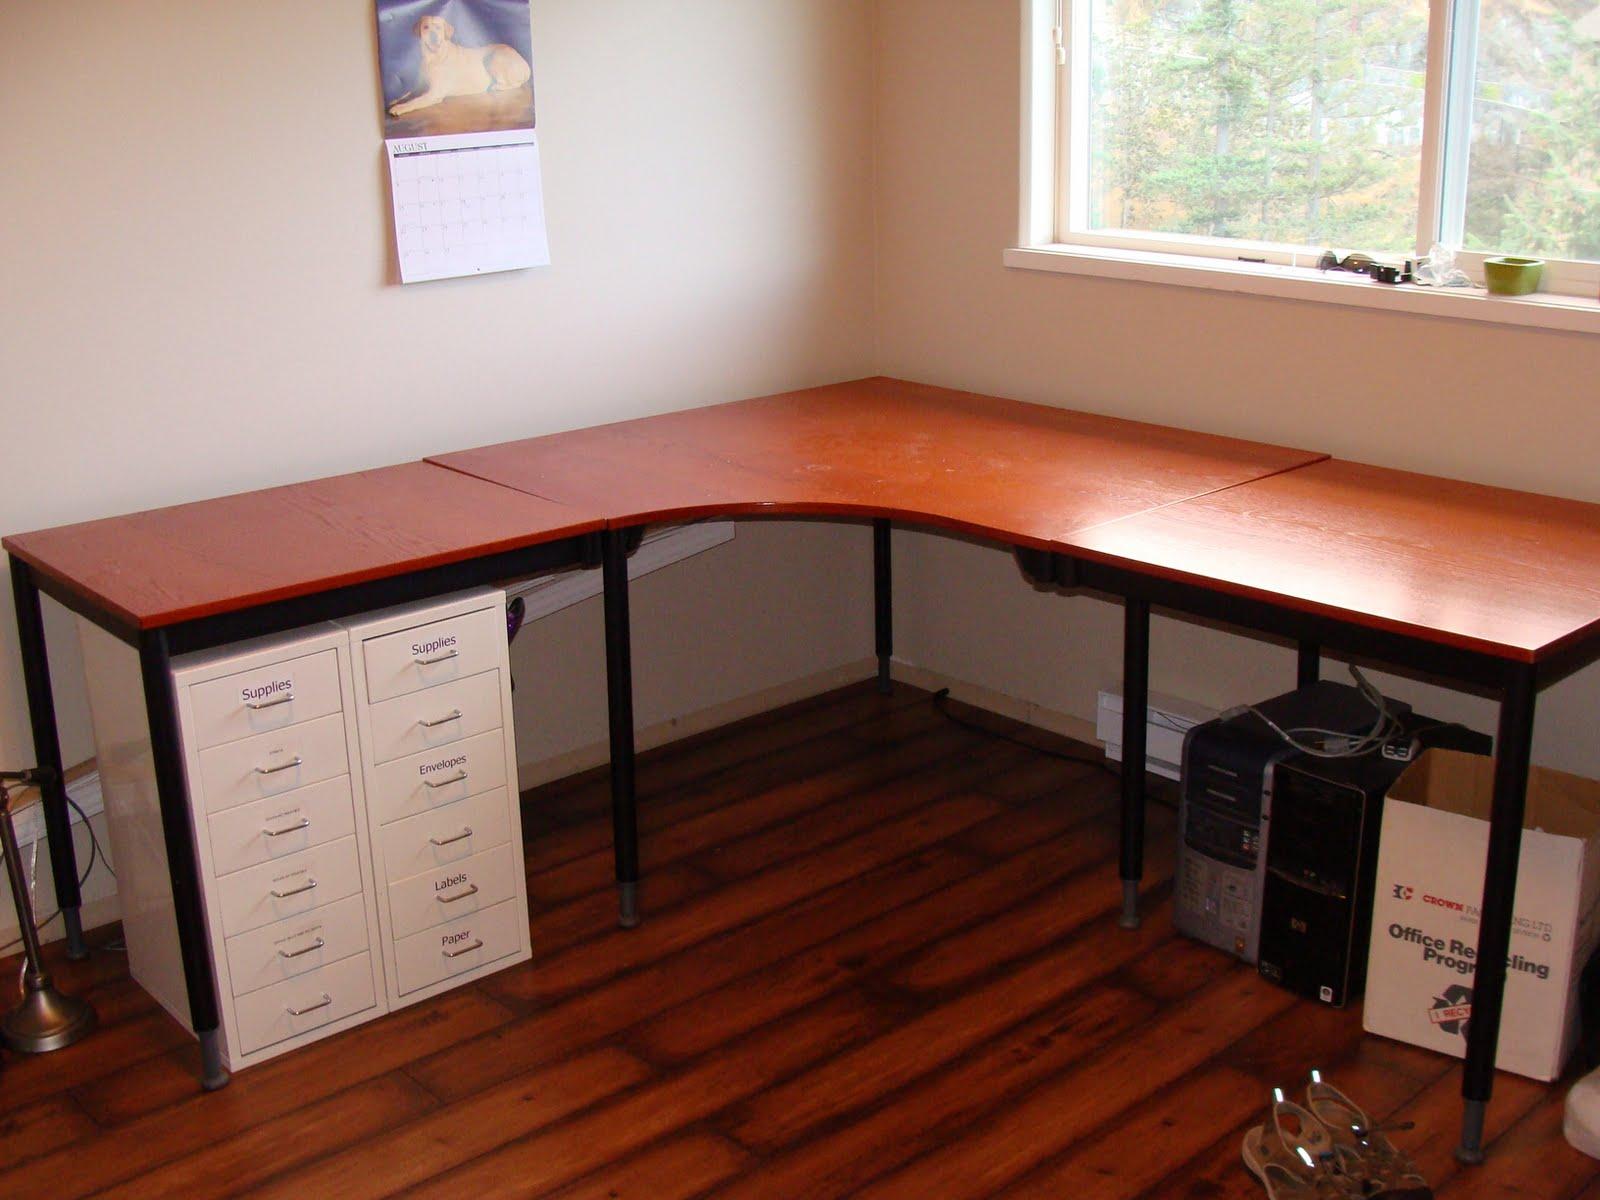 Pottery Barn Inspired Desk Transformation IKEA Hackers